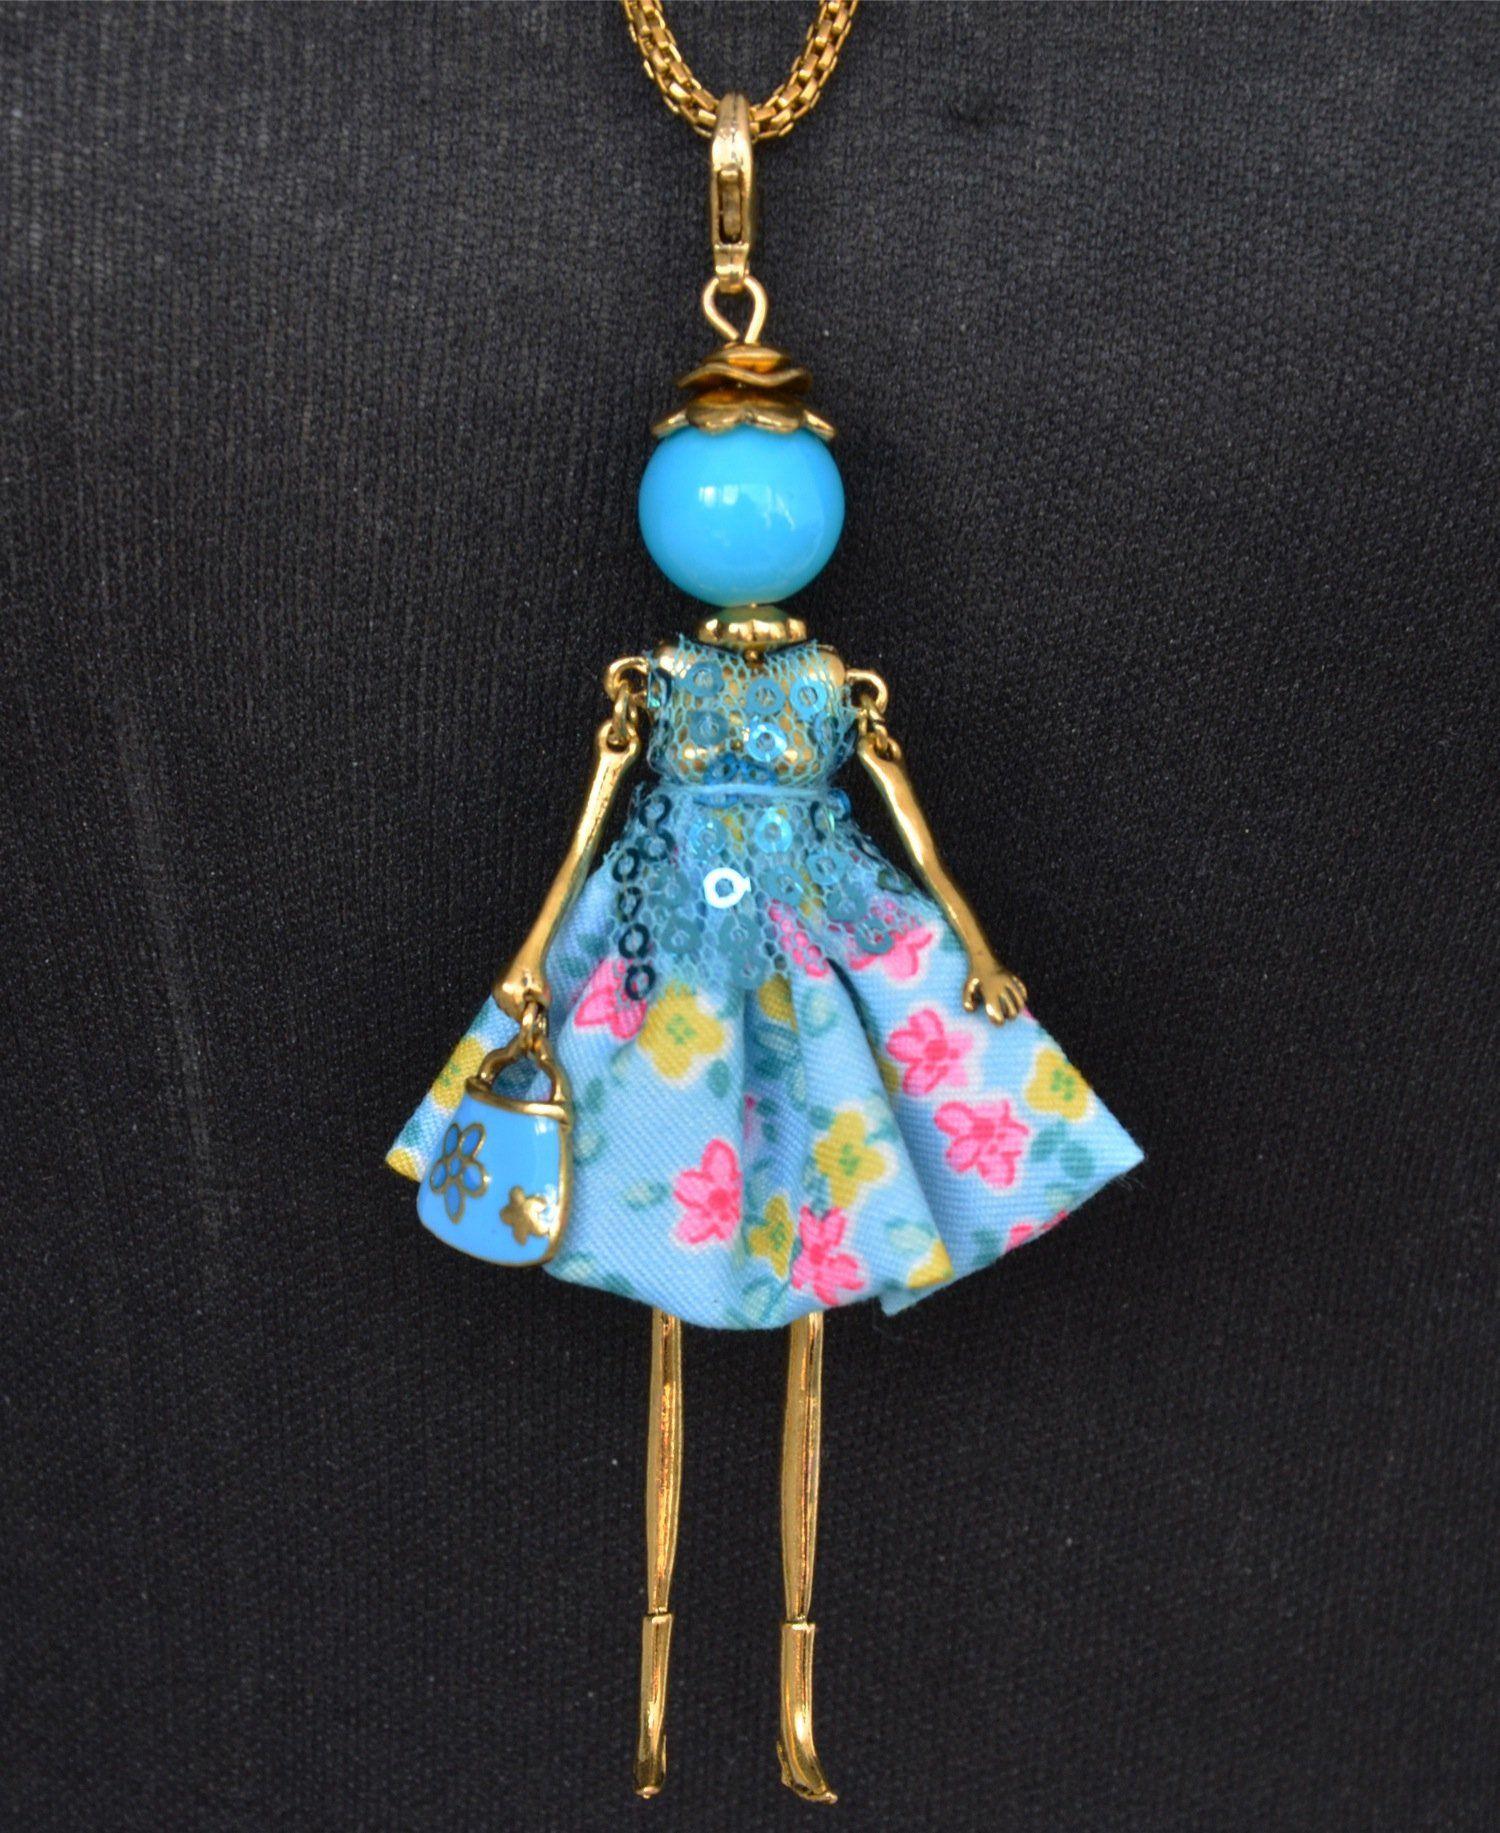 sp175 - sautoir collier pendentif poup u00e9e femme et cha u00eene m u00e9tal